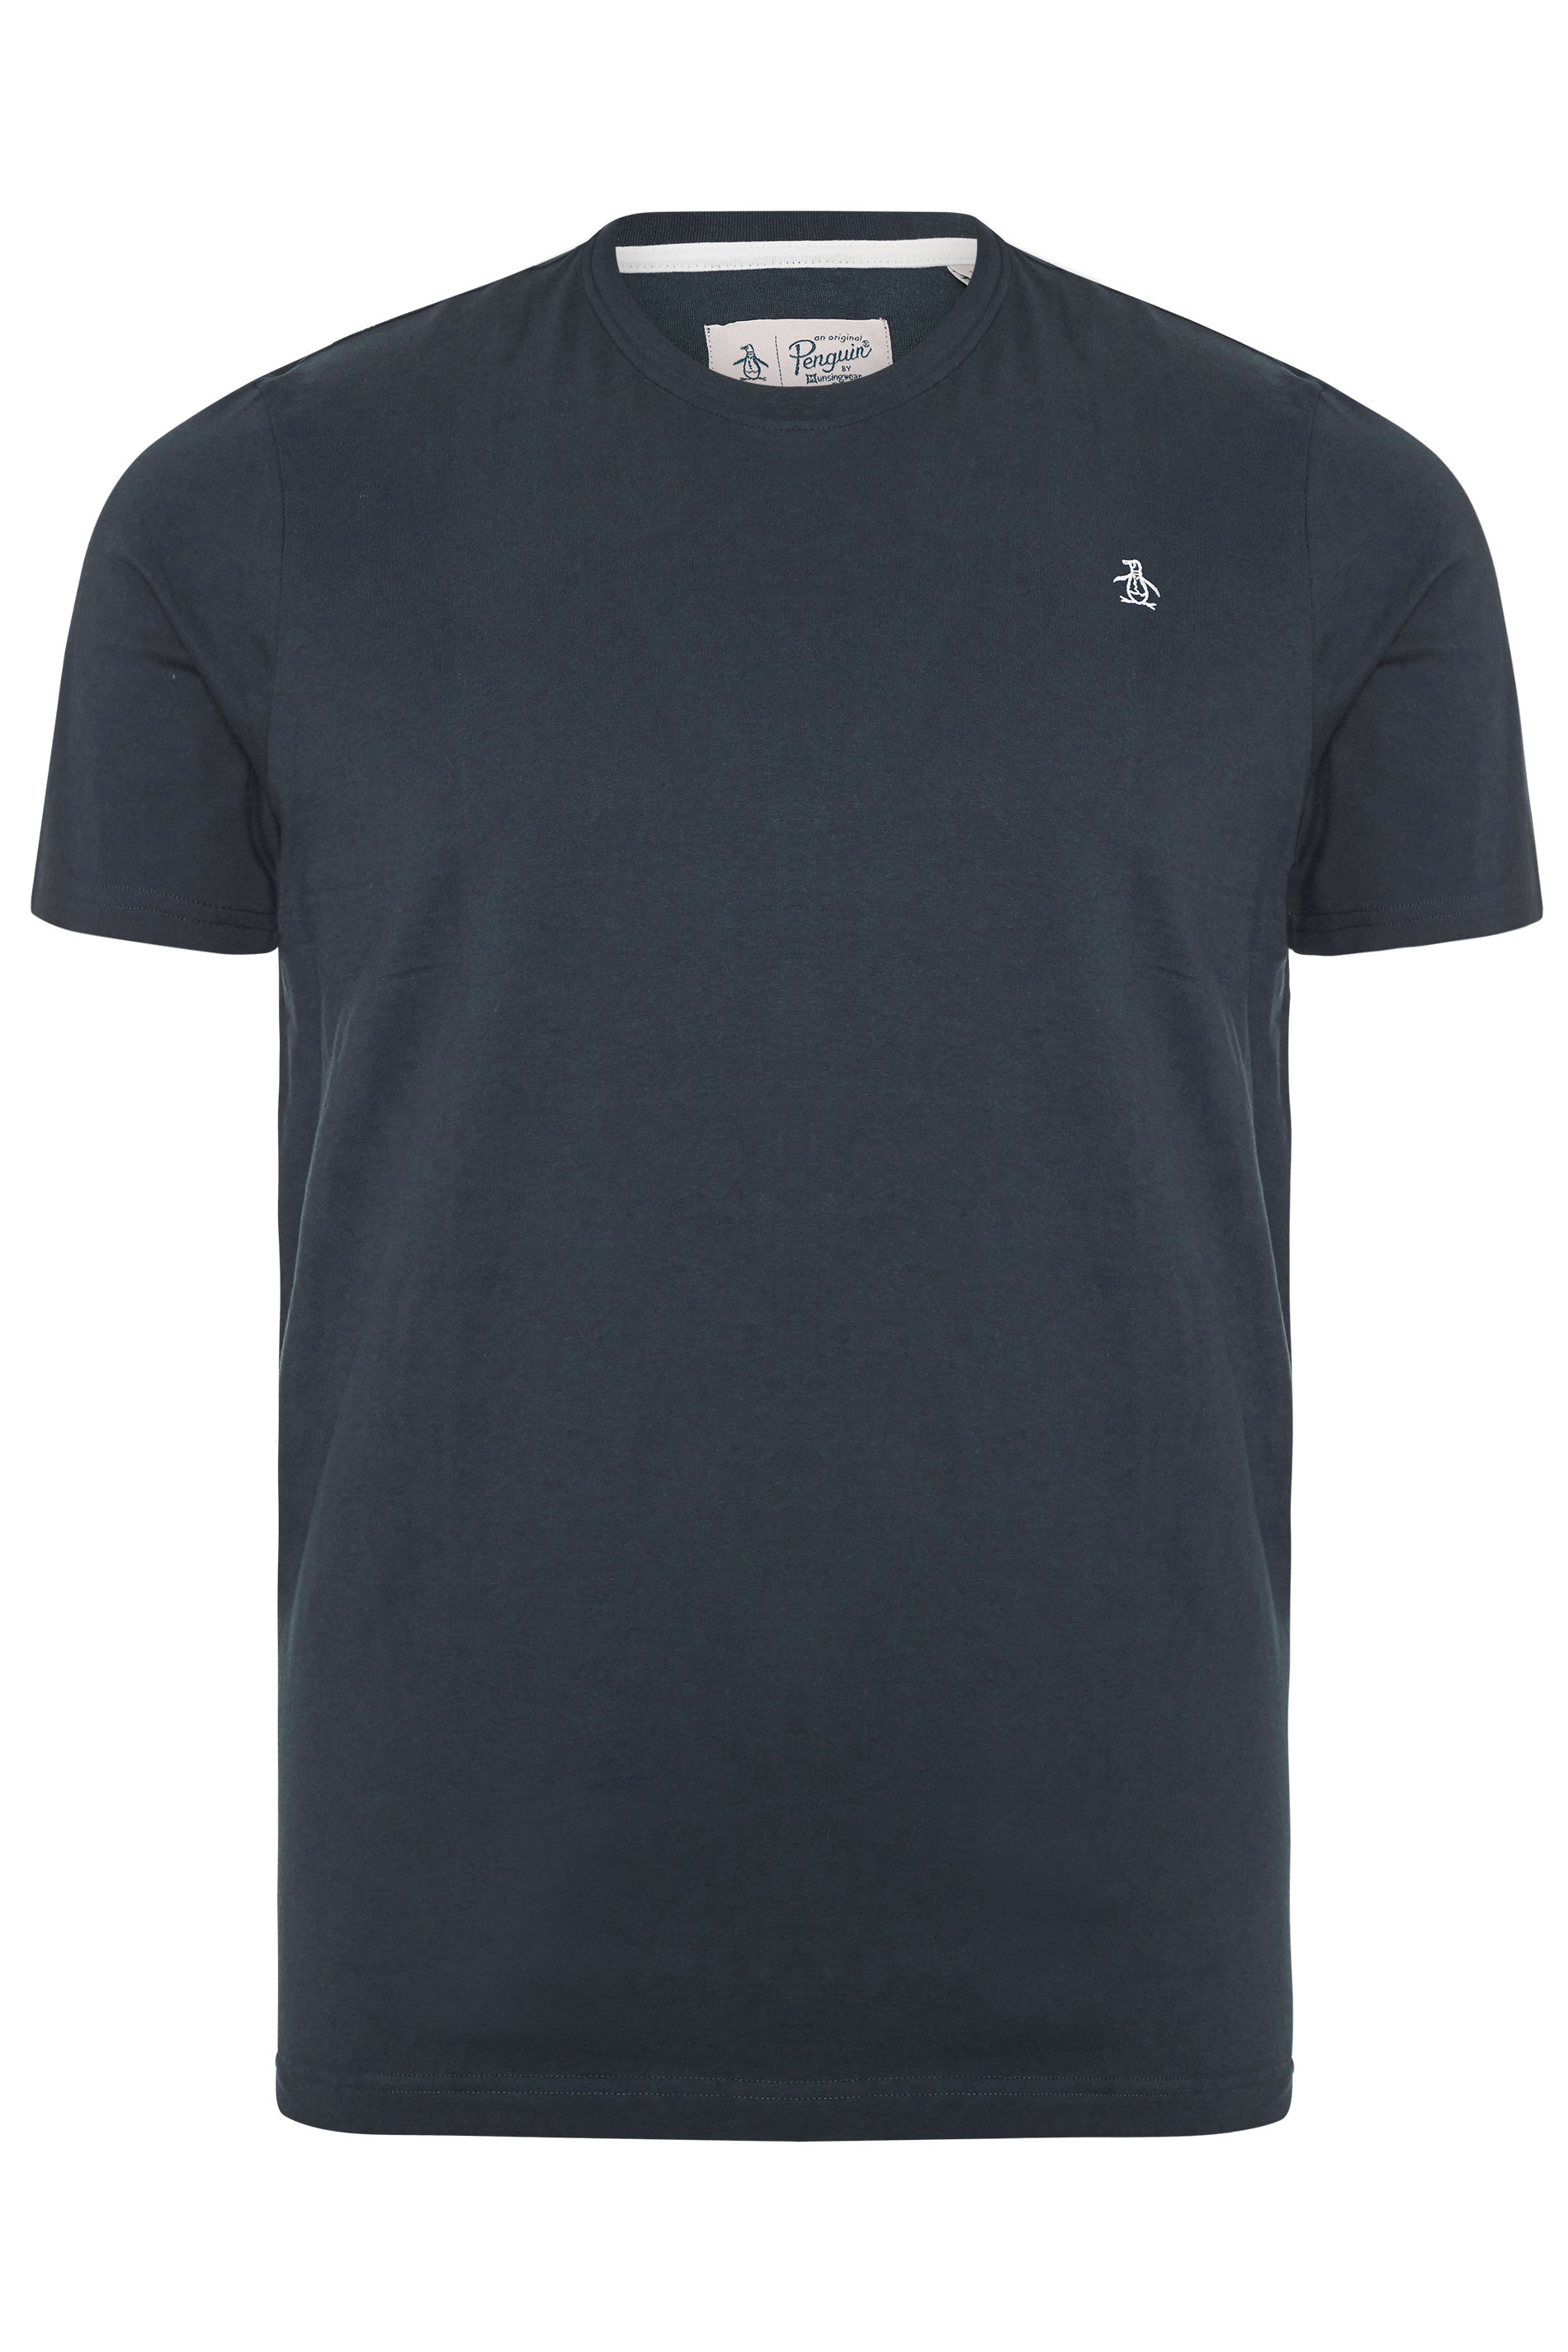 PENGUIN MUNSINGWEAR T-Shirt - Navy